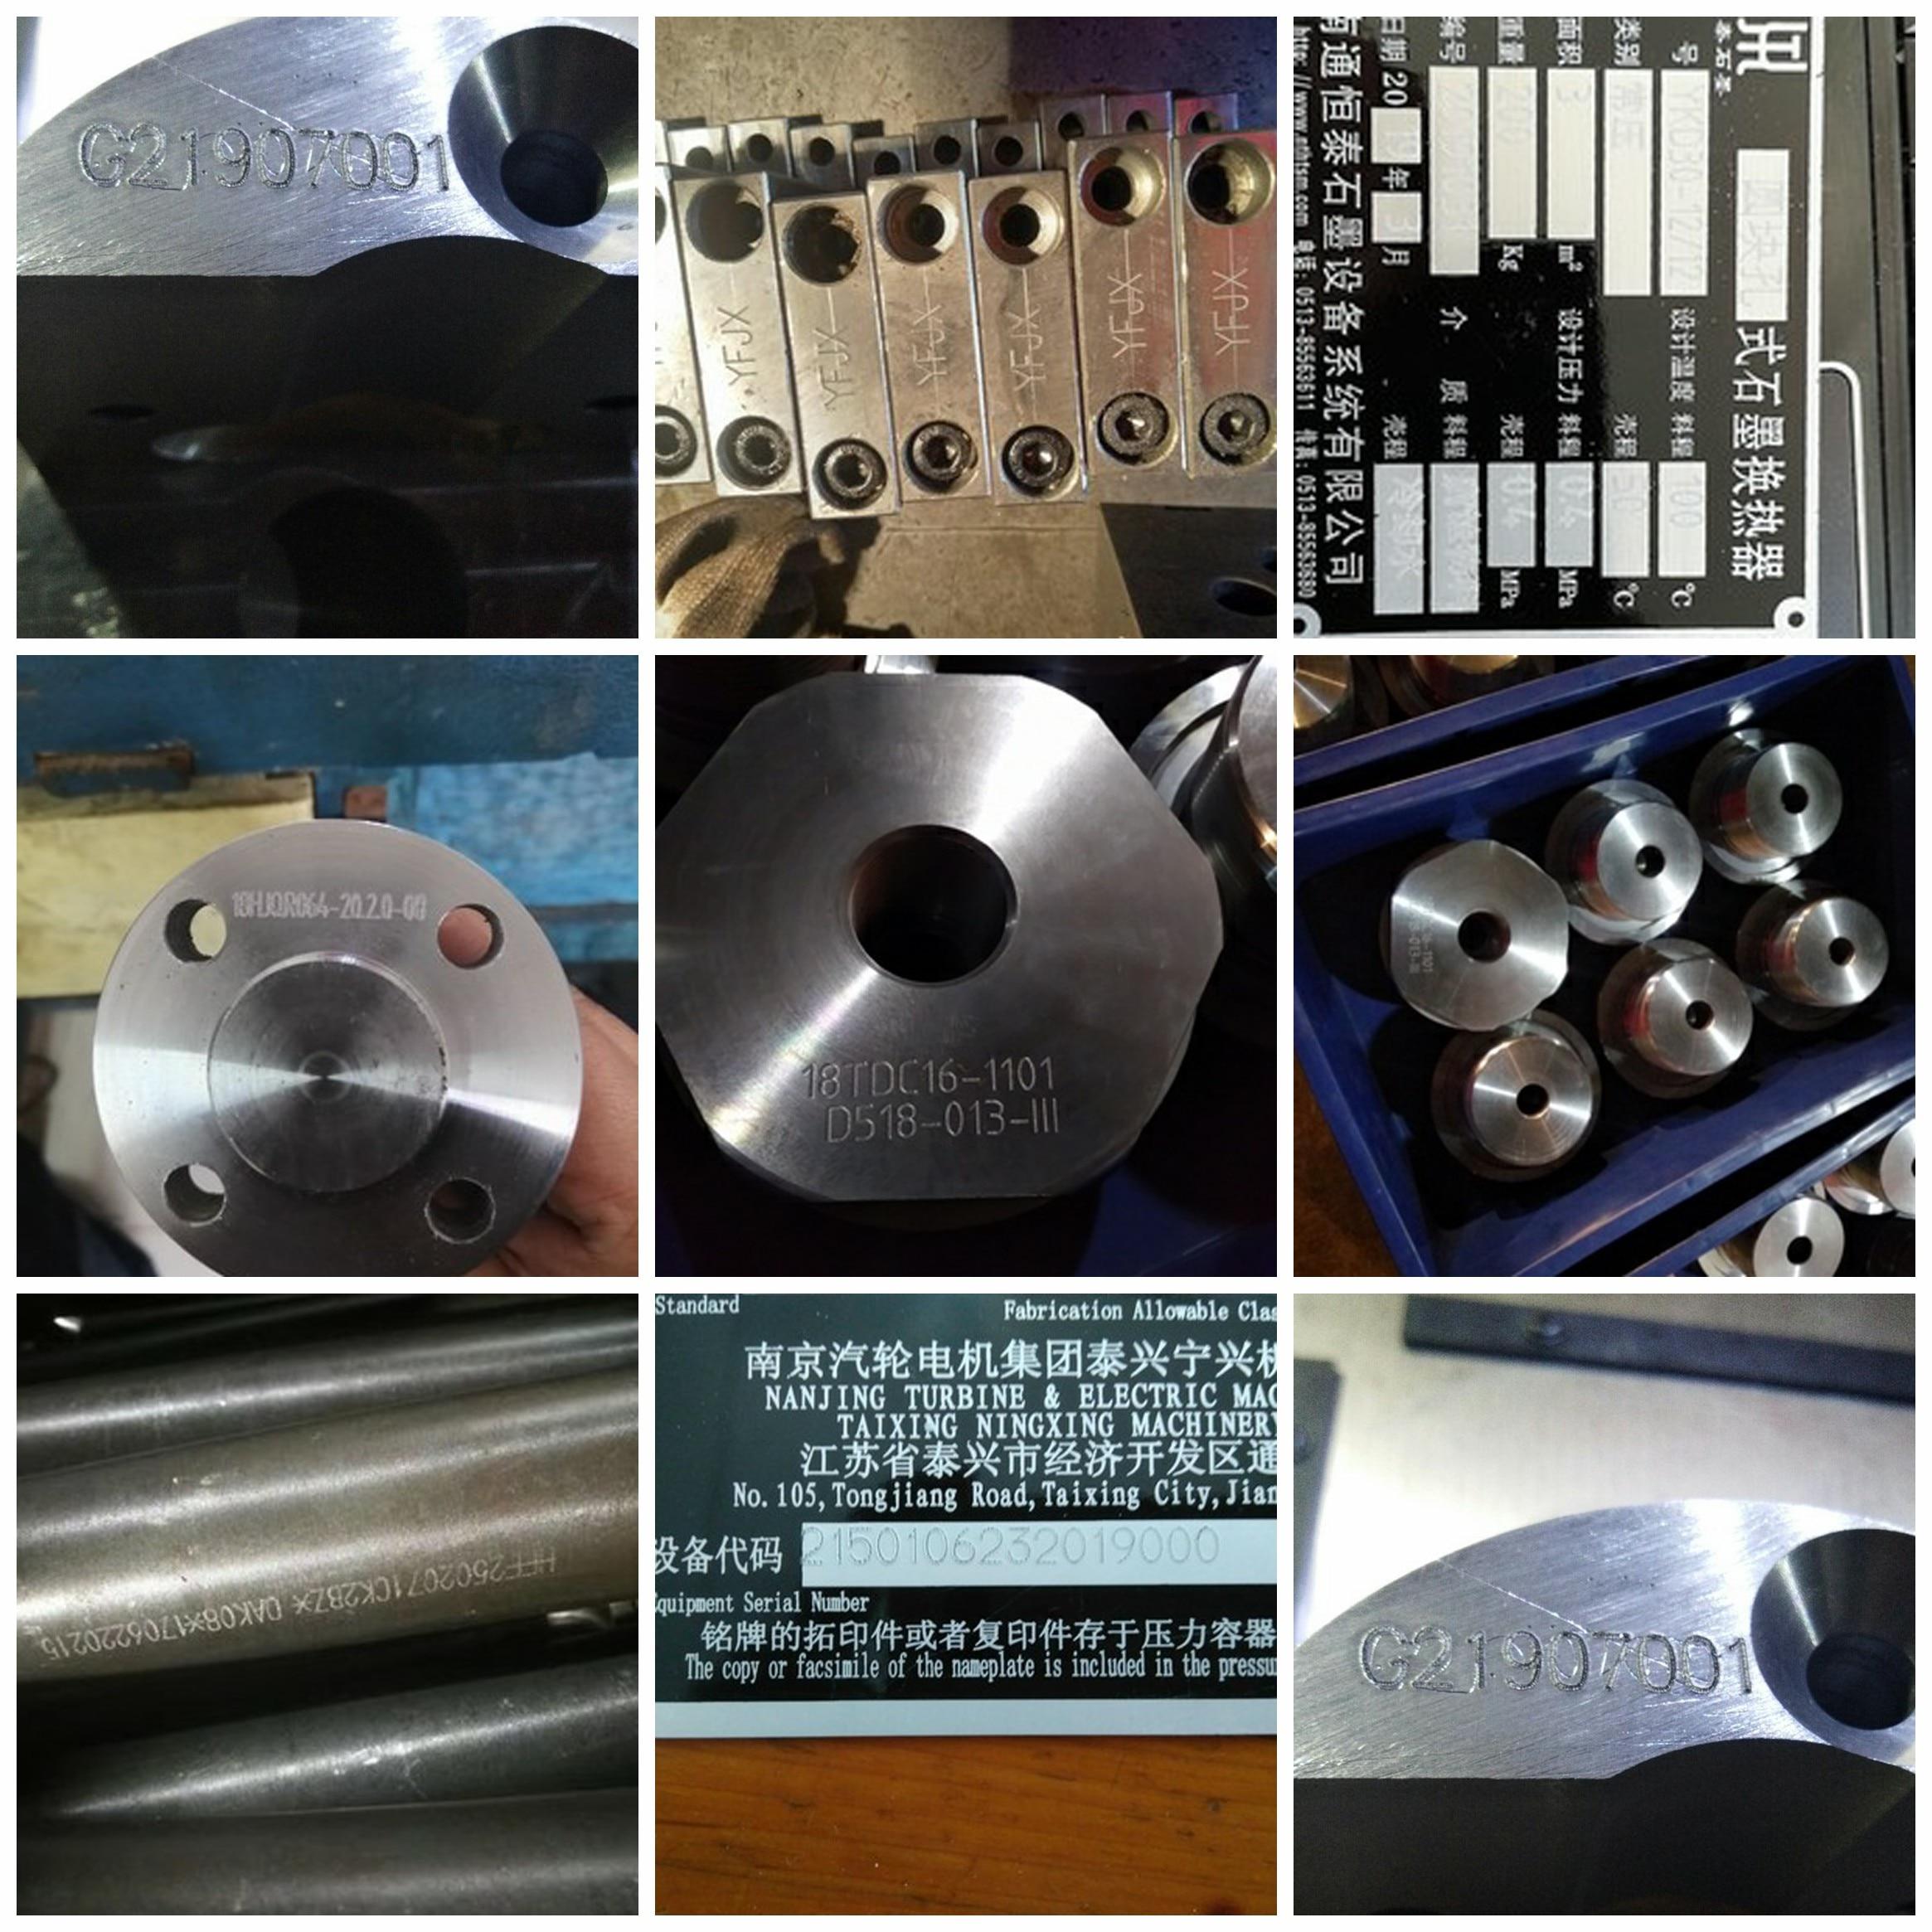 Nissan VIN font Cnc Engraving Machine Pneumatic Marking Machine Portable Marking Machine Vin Number Marking Machine